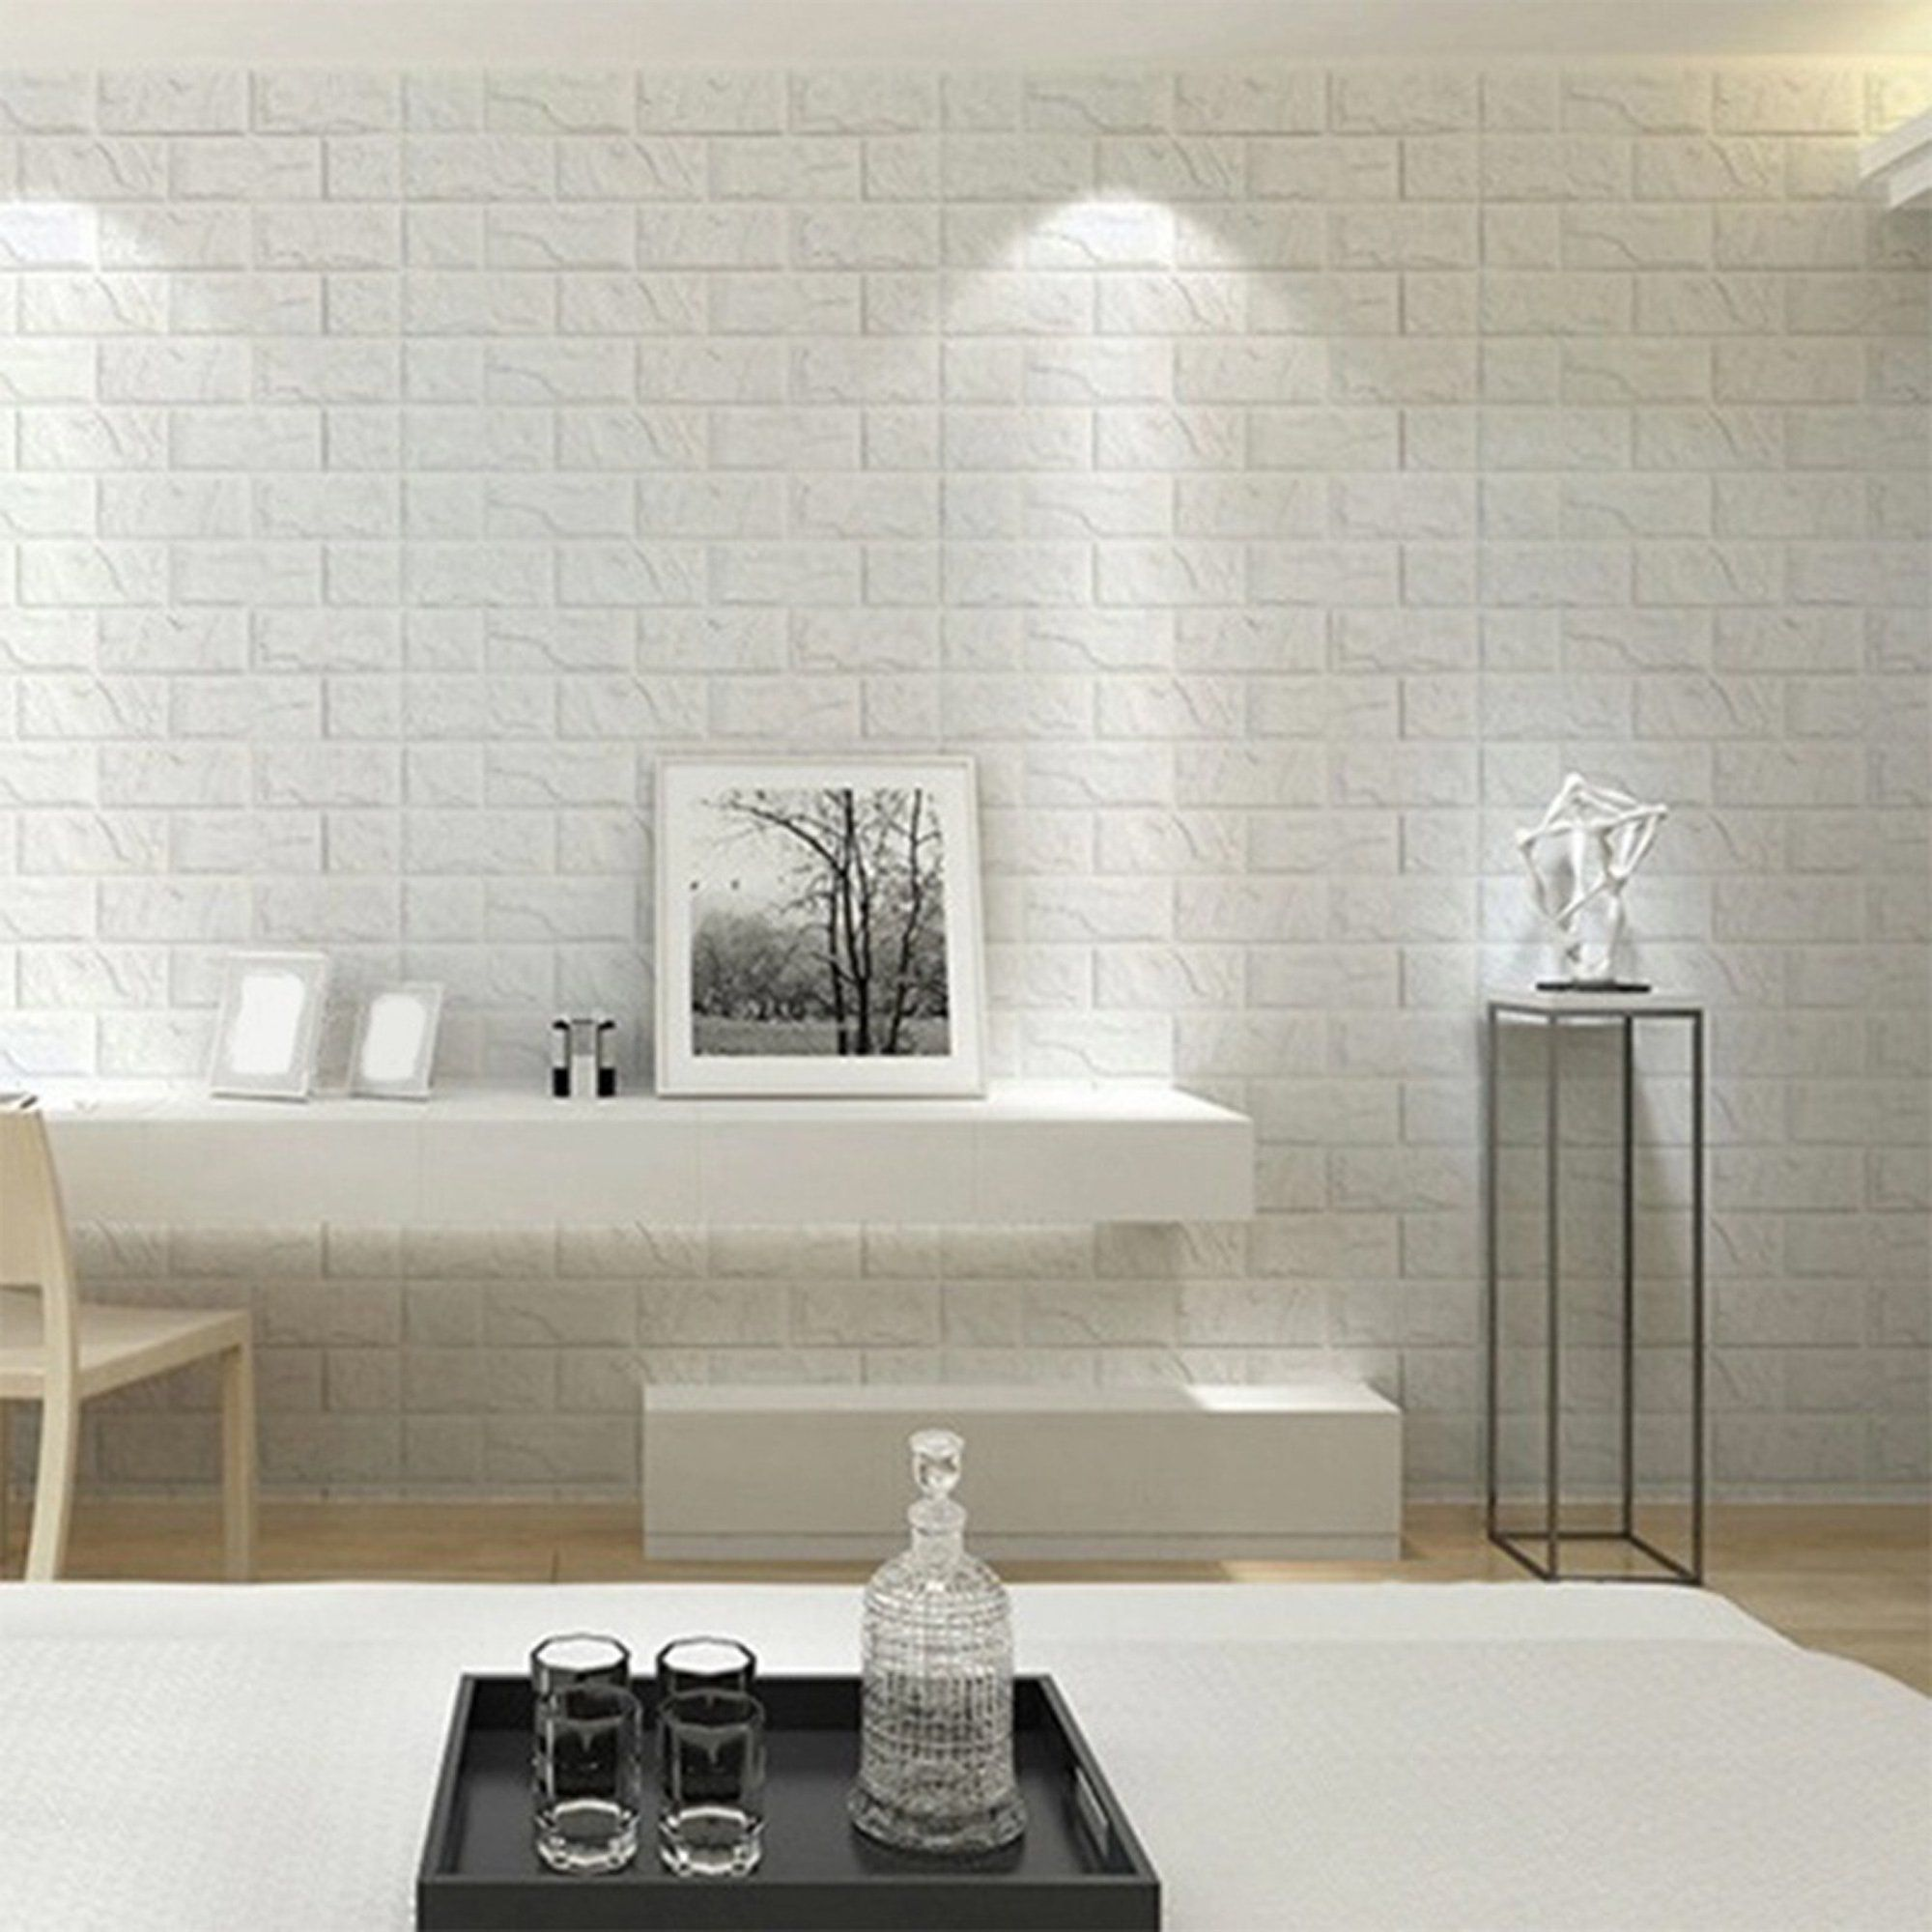 Nk 1 200pcs 3d Self Adhesive Wall Panels Faux Foam White Brick Wallpaper For Tv Walls White Brick Wallpaper Brick Wall Paneling Brick Wallpaper Peel And Stick